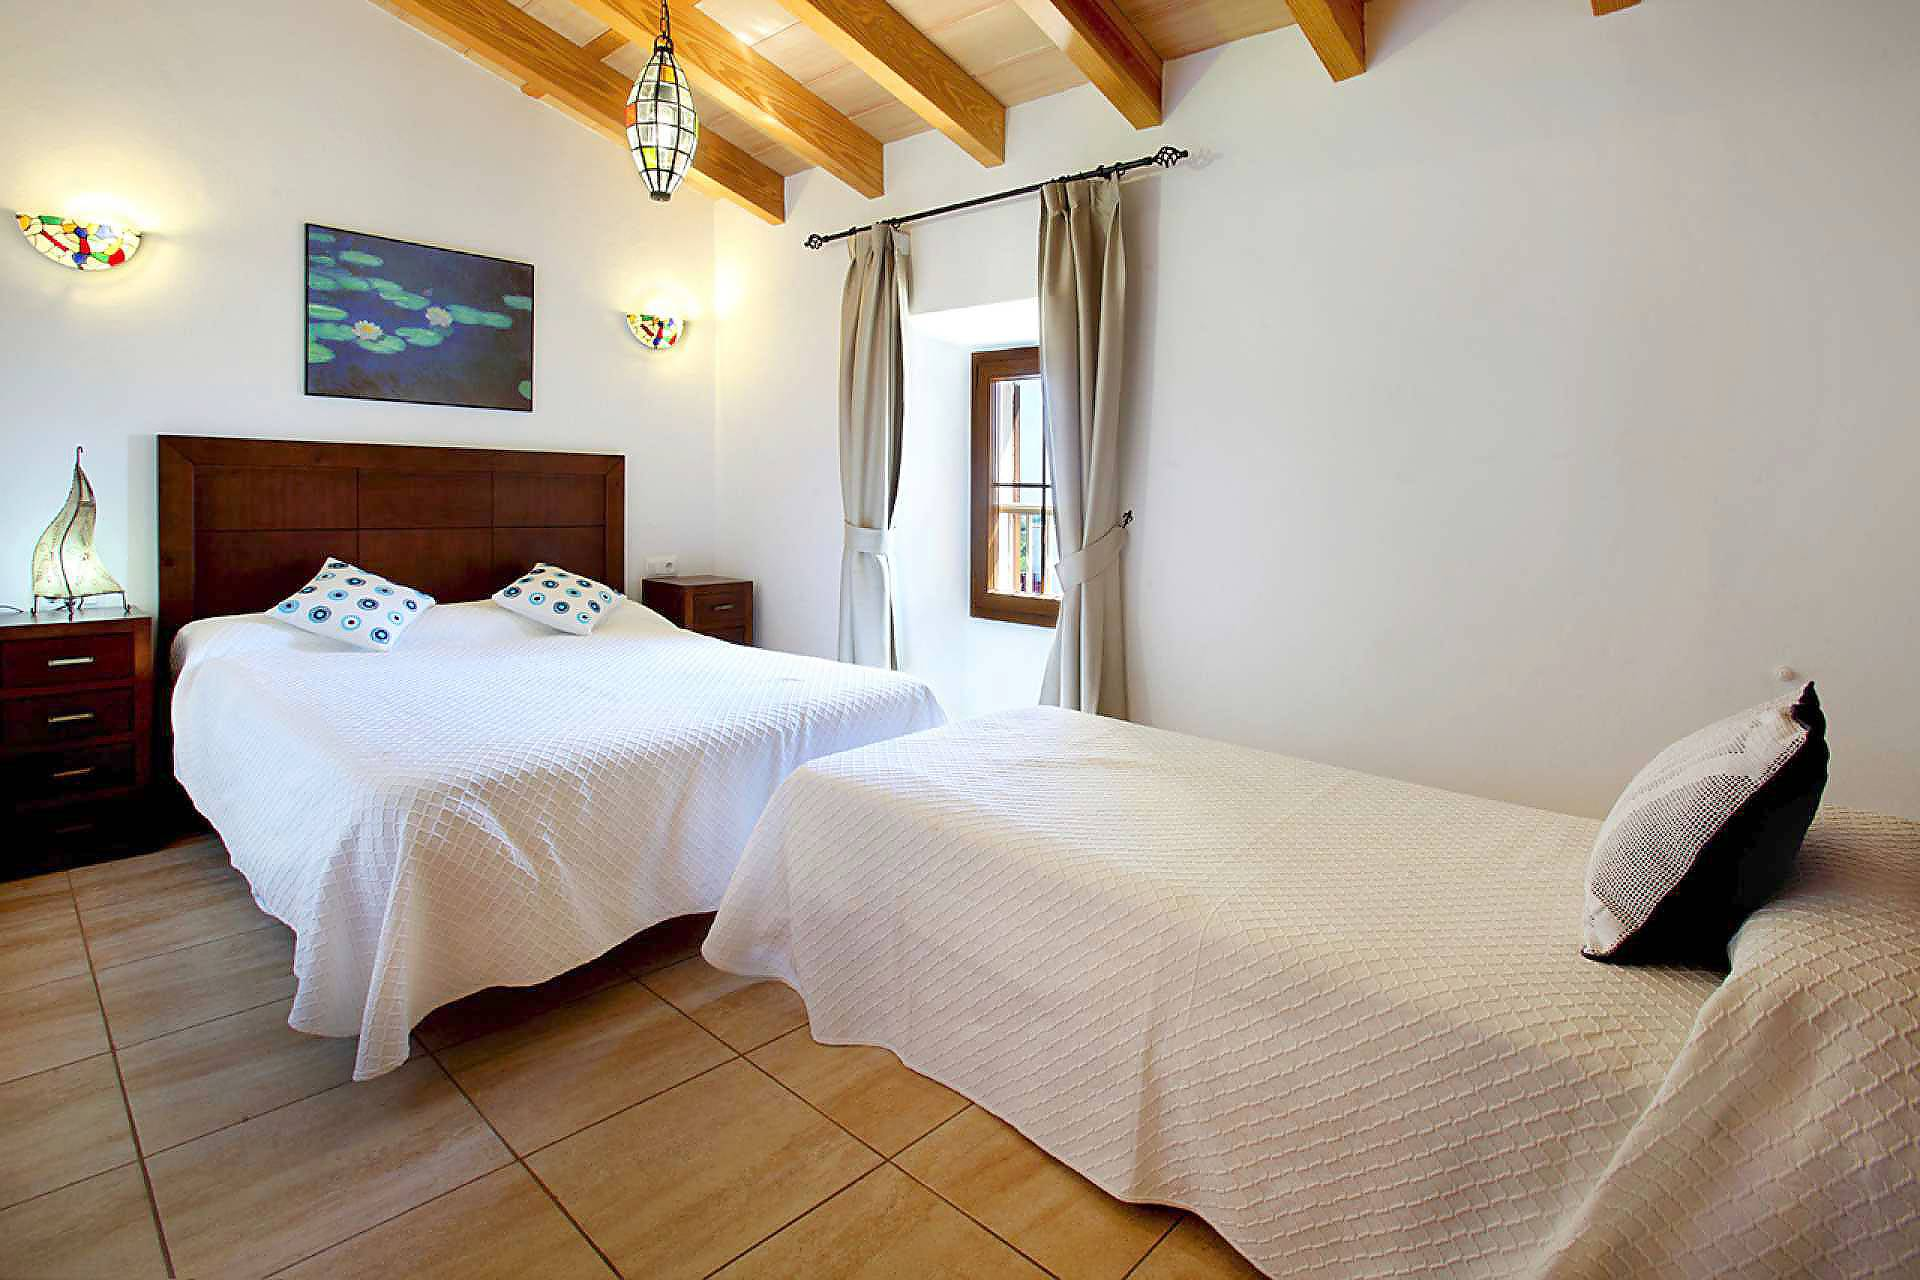 01-33 Spacious holiday home Mallorca East Bild 33